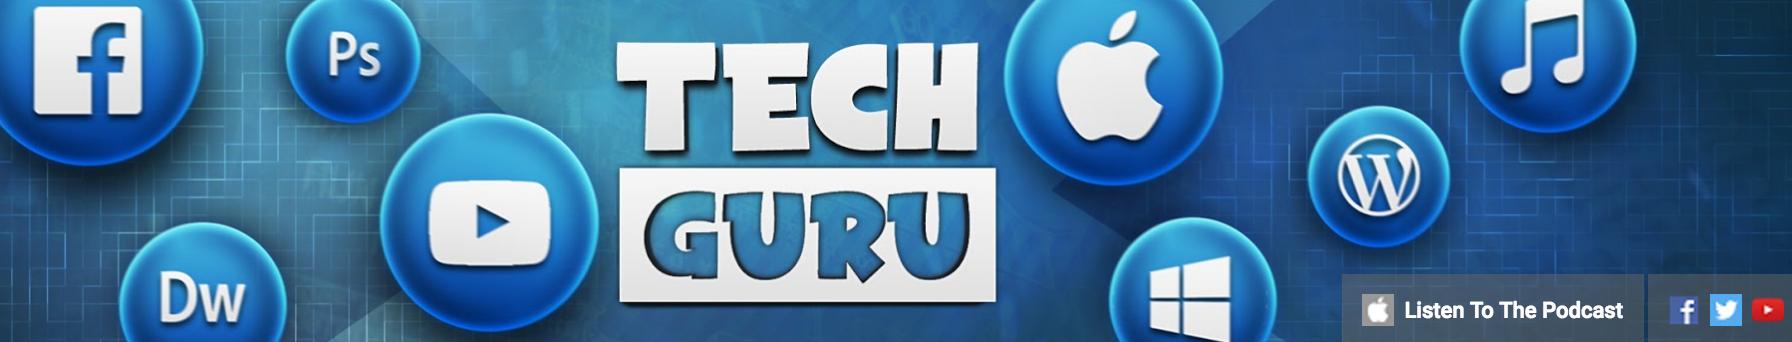 technologyguru YouTube Channel